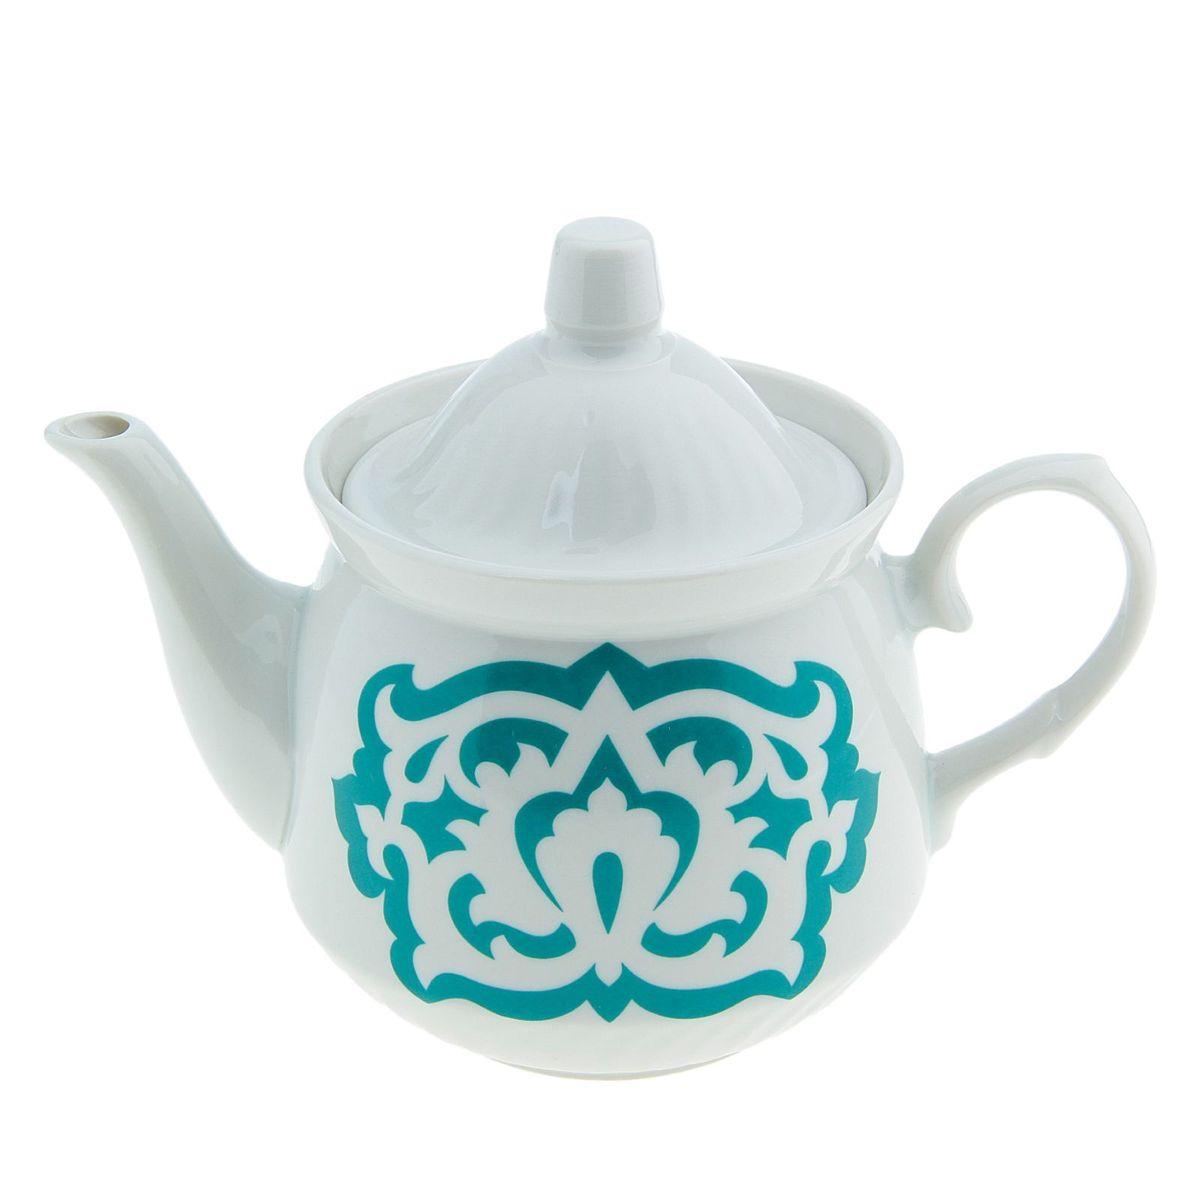 Чайник Кирмаш. Азия, цвет: зеленый, 550 мл507847